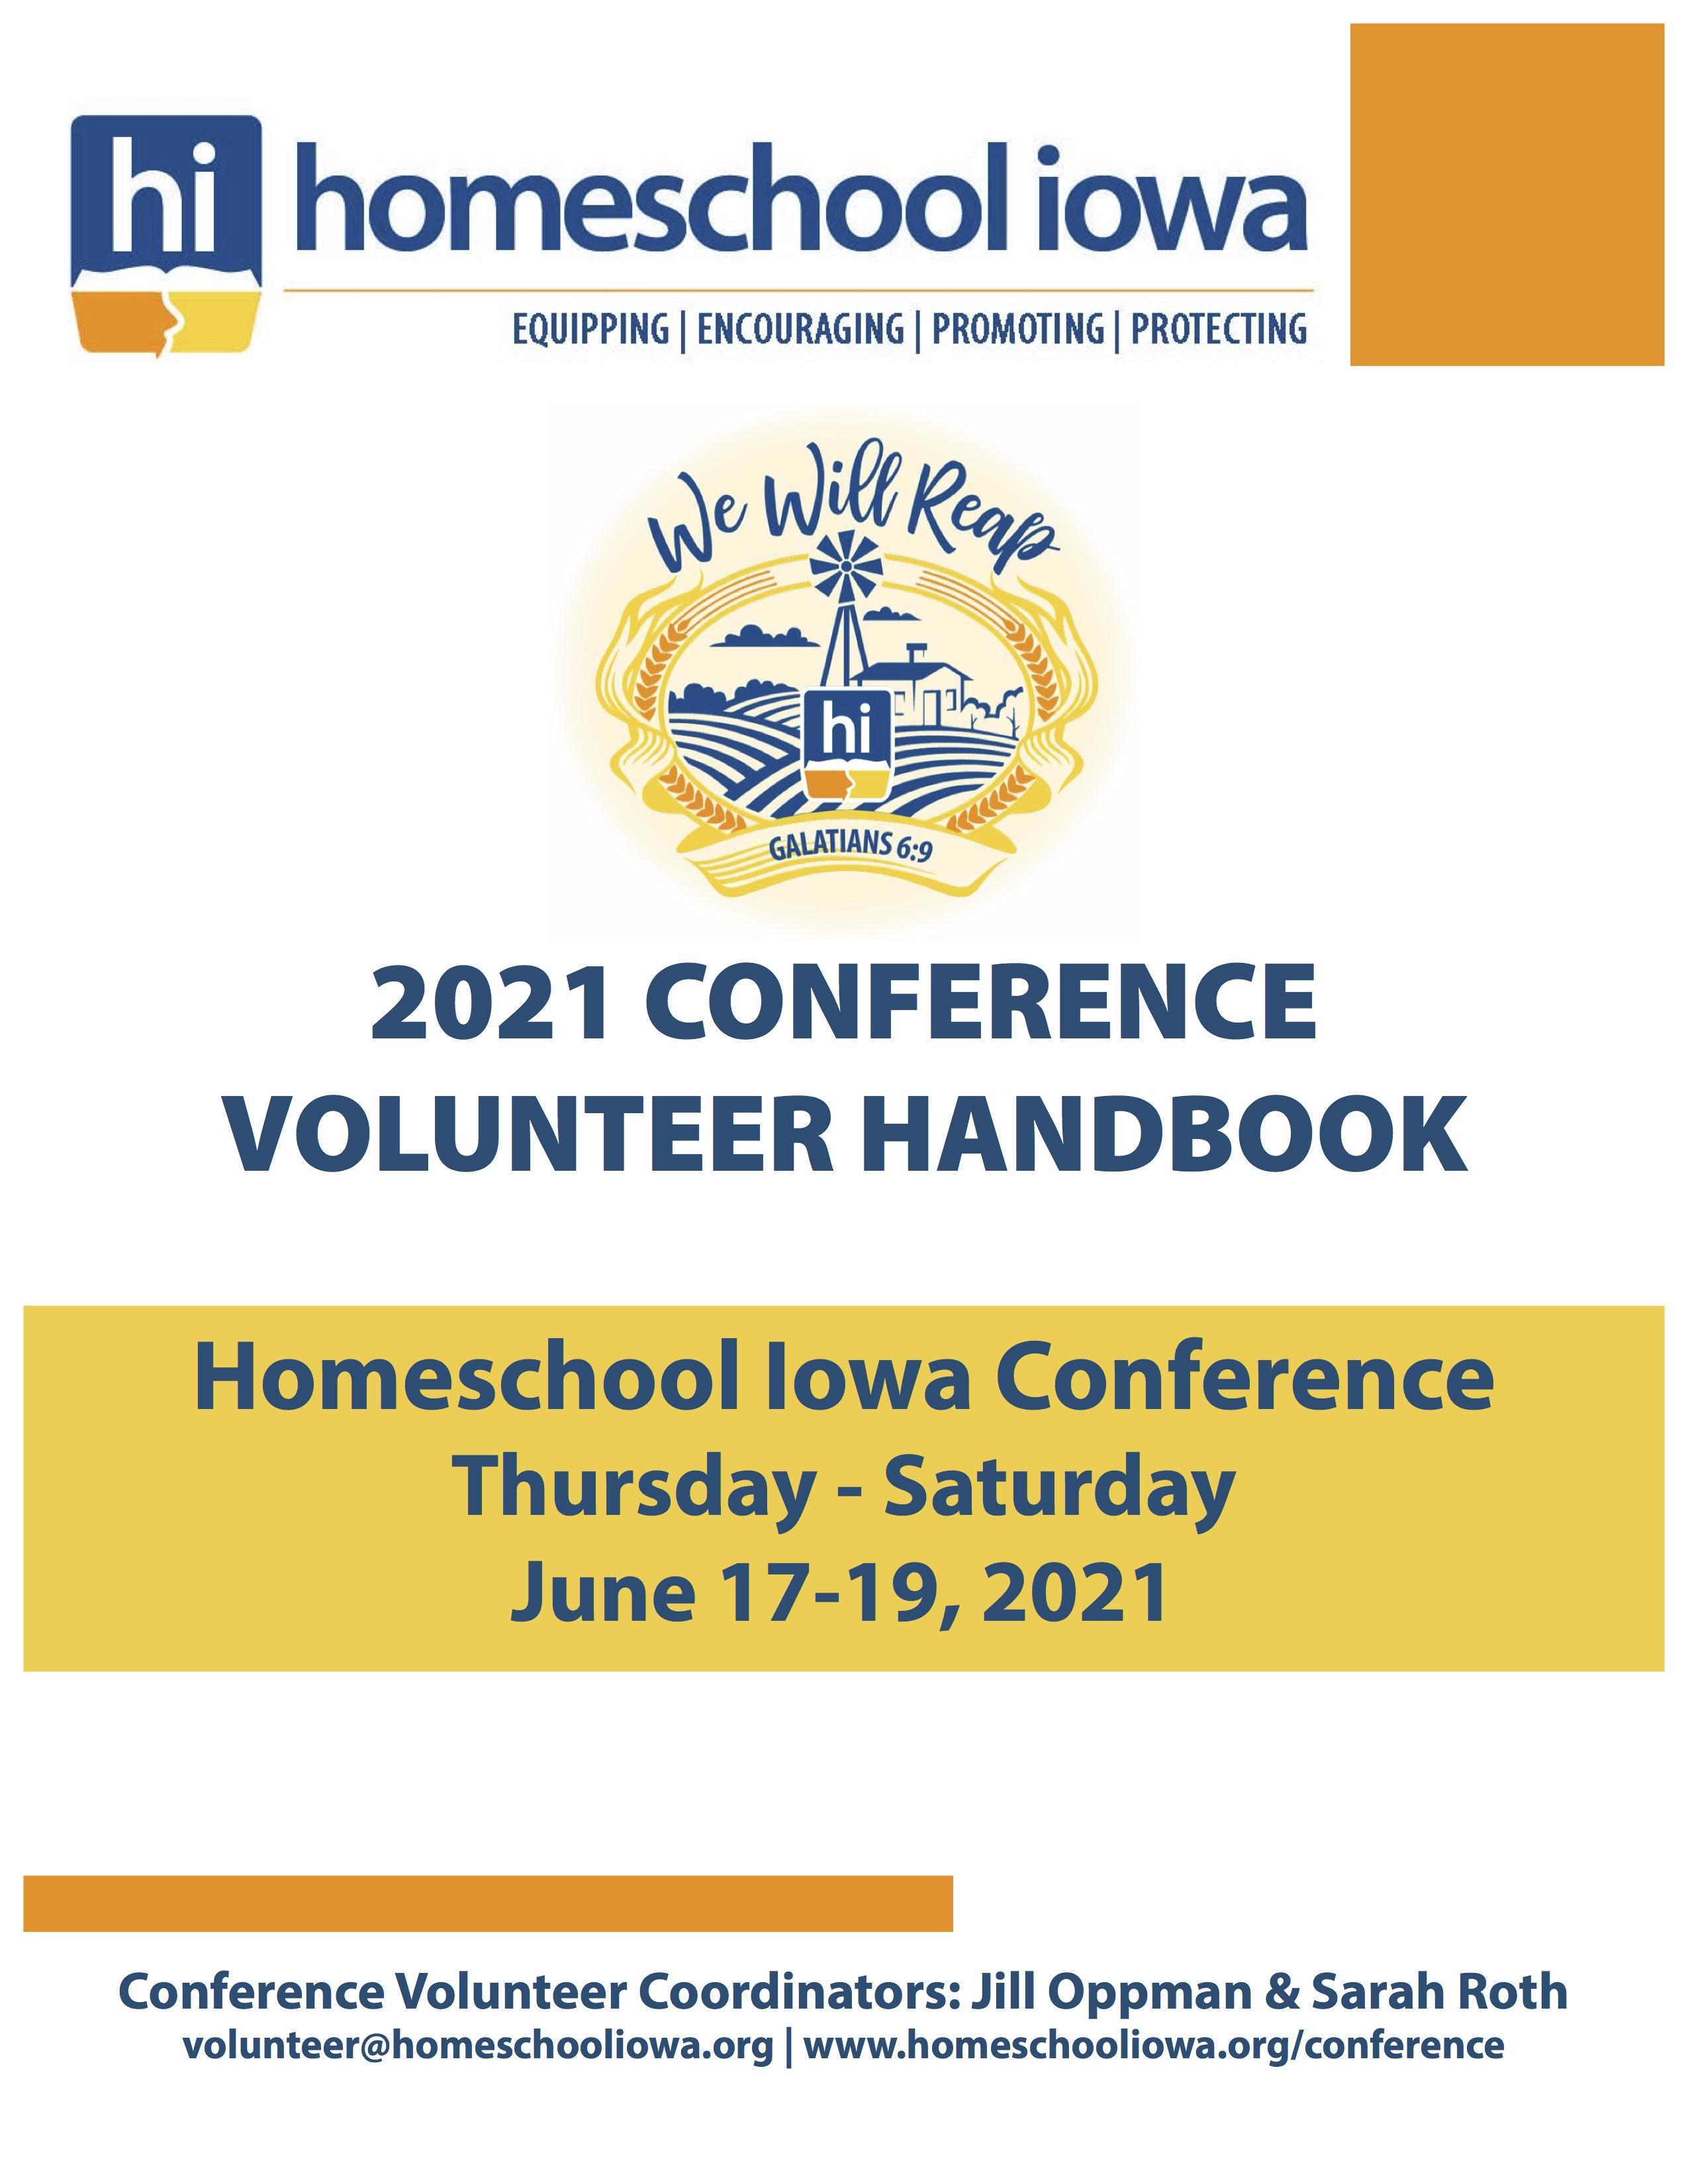 2021 Conference Volunteer Handbook